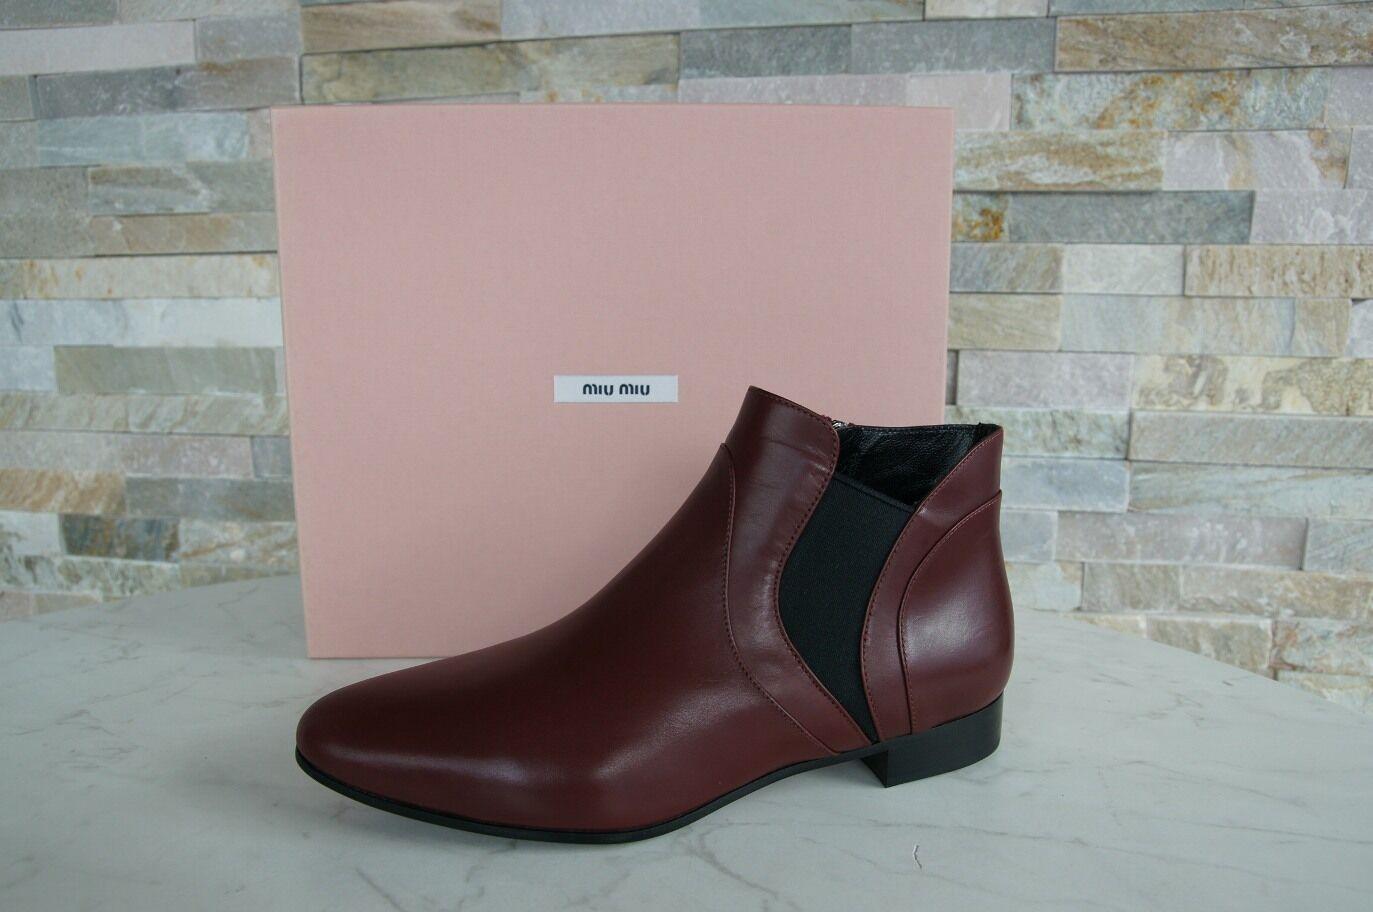 Miu Miu Gr 38 Botines de Tobillo Tobillo Tobillo Zapatos Botines 5T9336 Rojo Nuevo Antiguo 945760